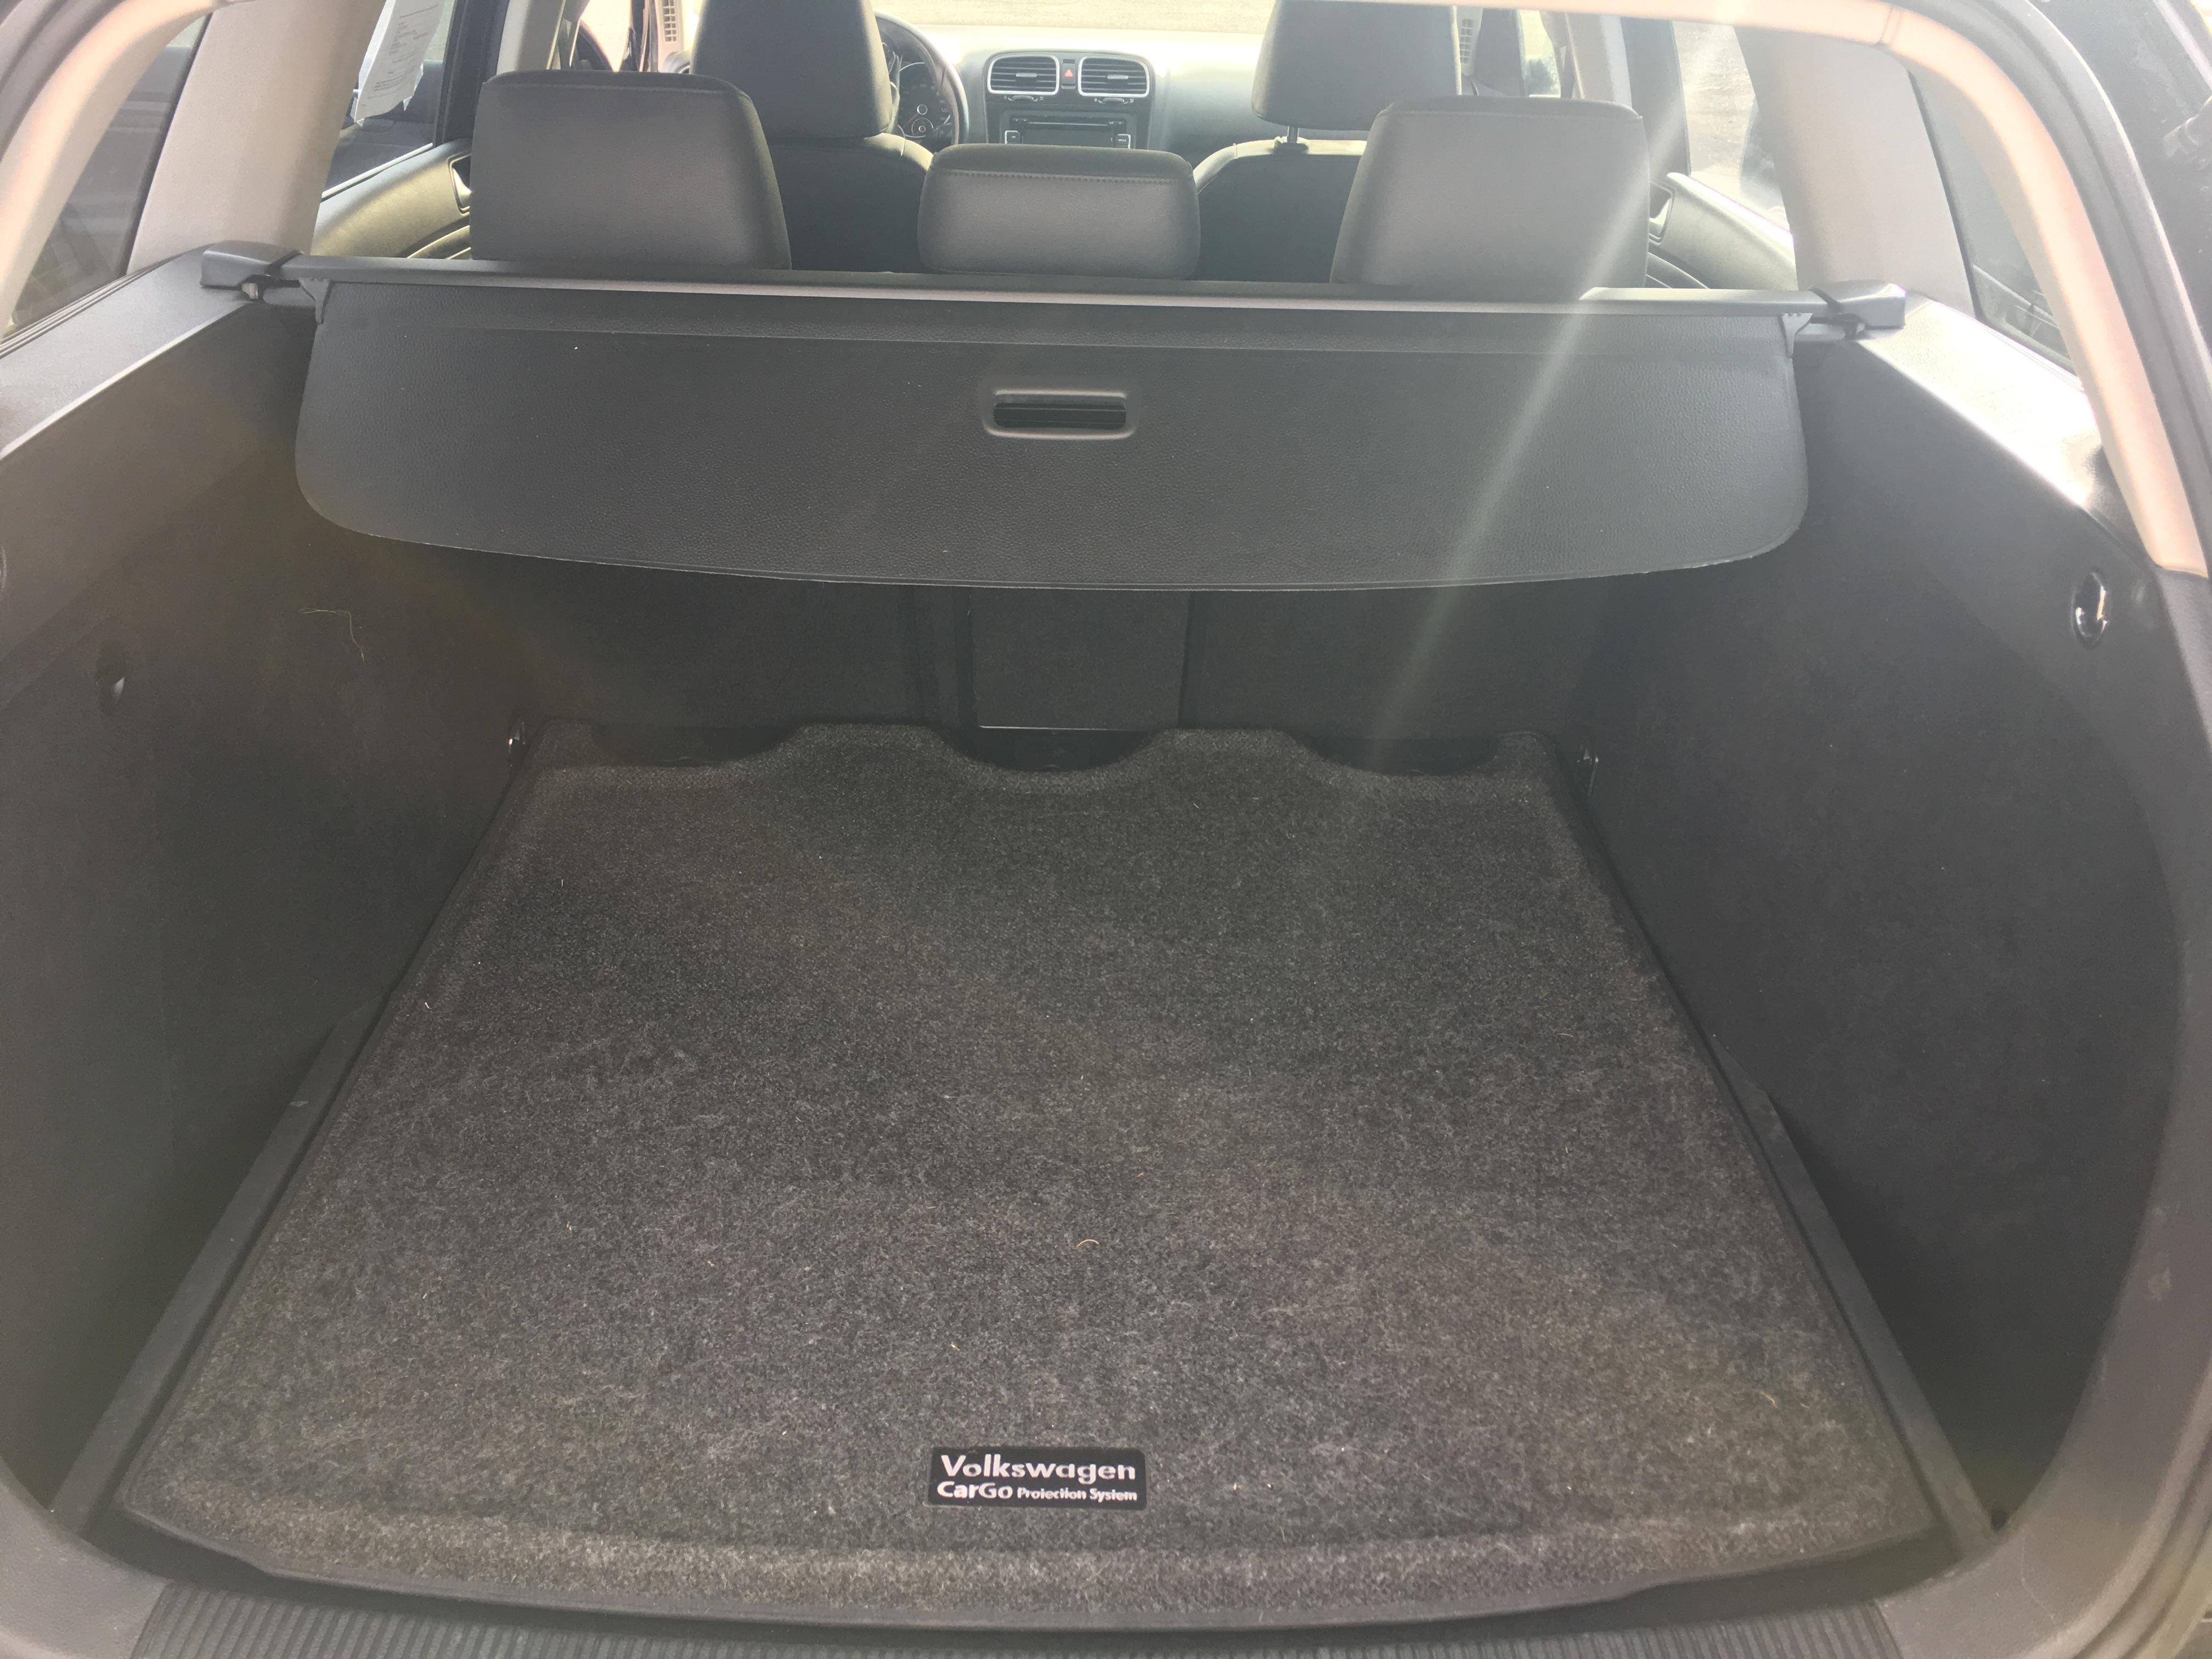 2013 Volkswagen Jetta Sportswagen